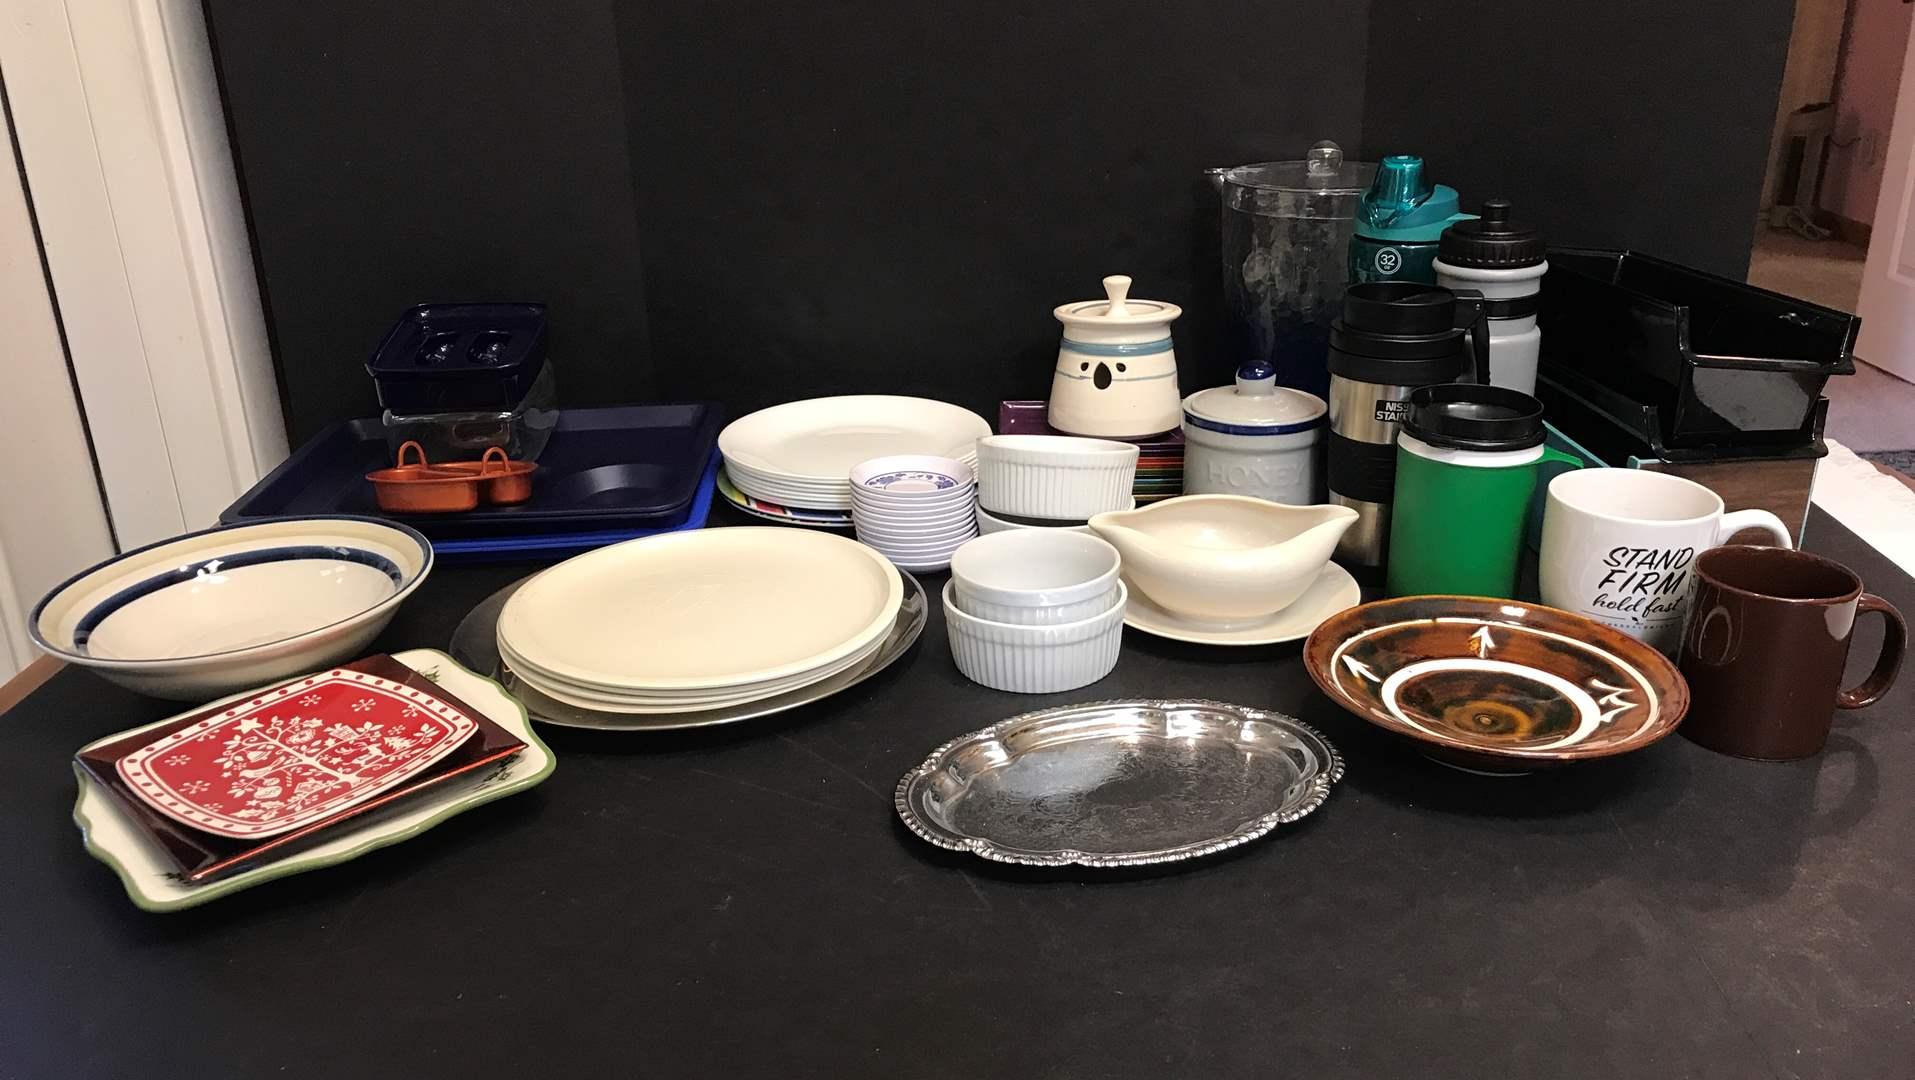 Lot # 76 - Lot of Misc. Kitchen Items: Corelle Plates, Plastic Plates & Water Bottles, Bowls & More  (main image)